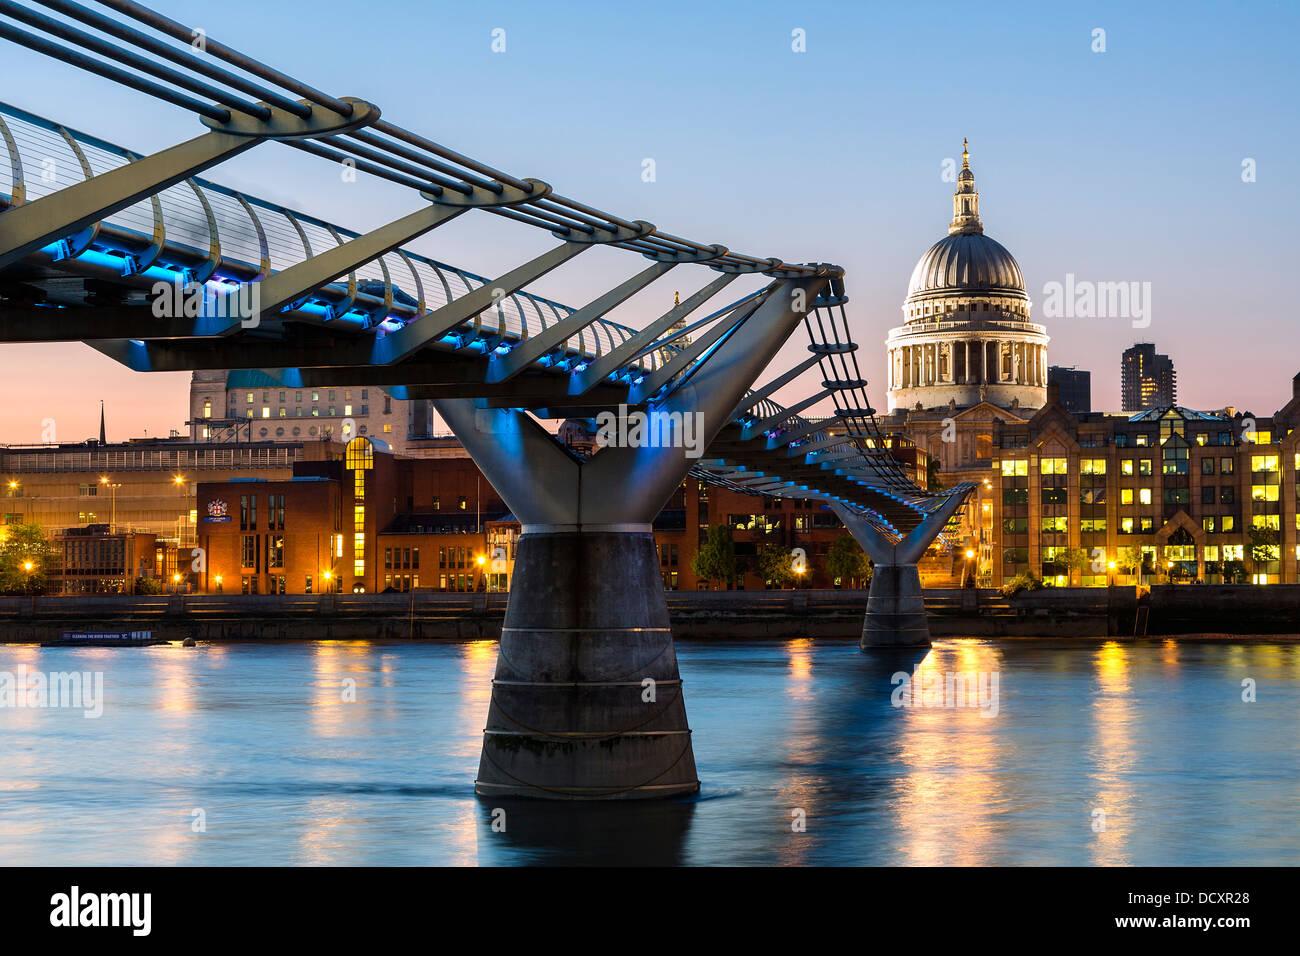 Inghilterra, Londra Millennium Footbridge e Cattedrale di San Paolo Immagini Stock